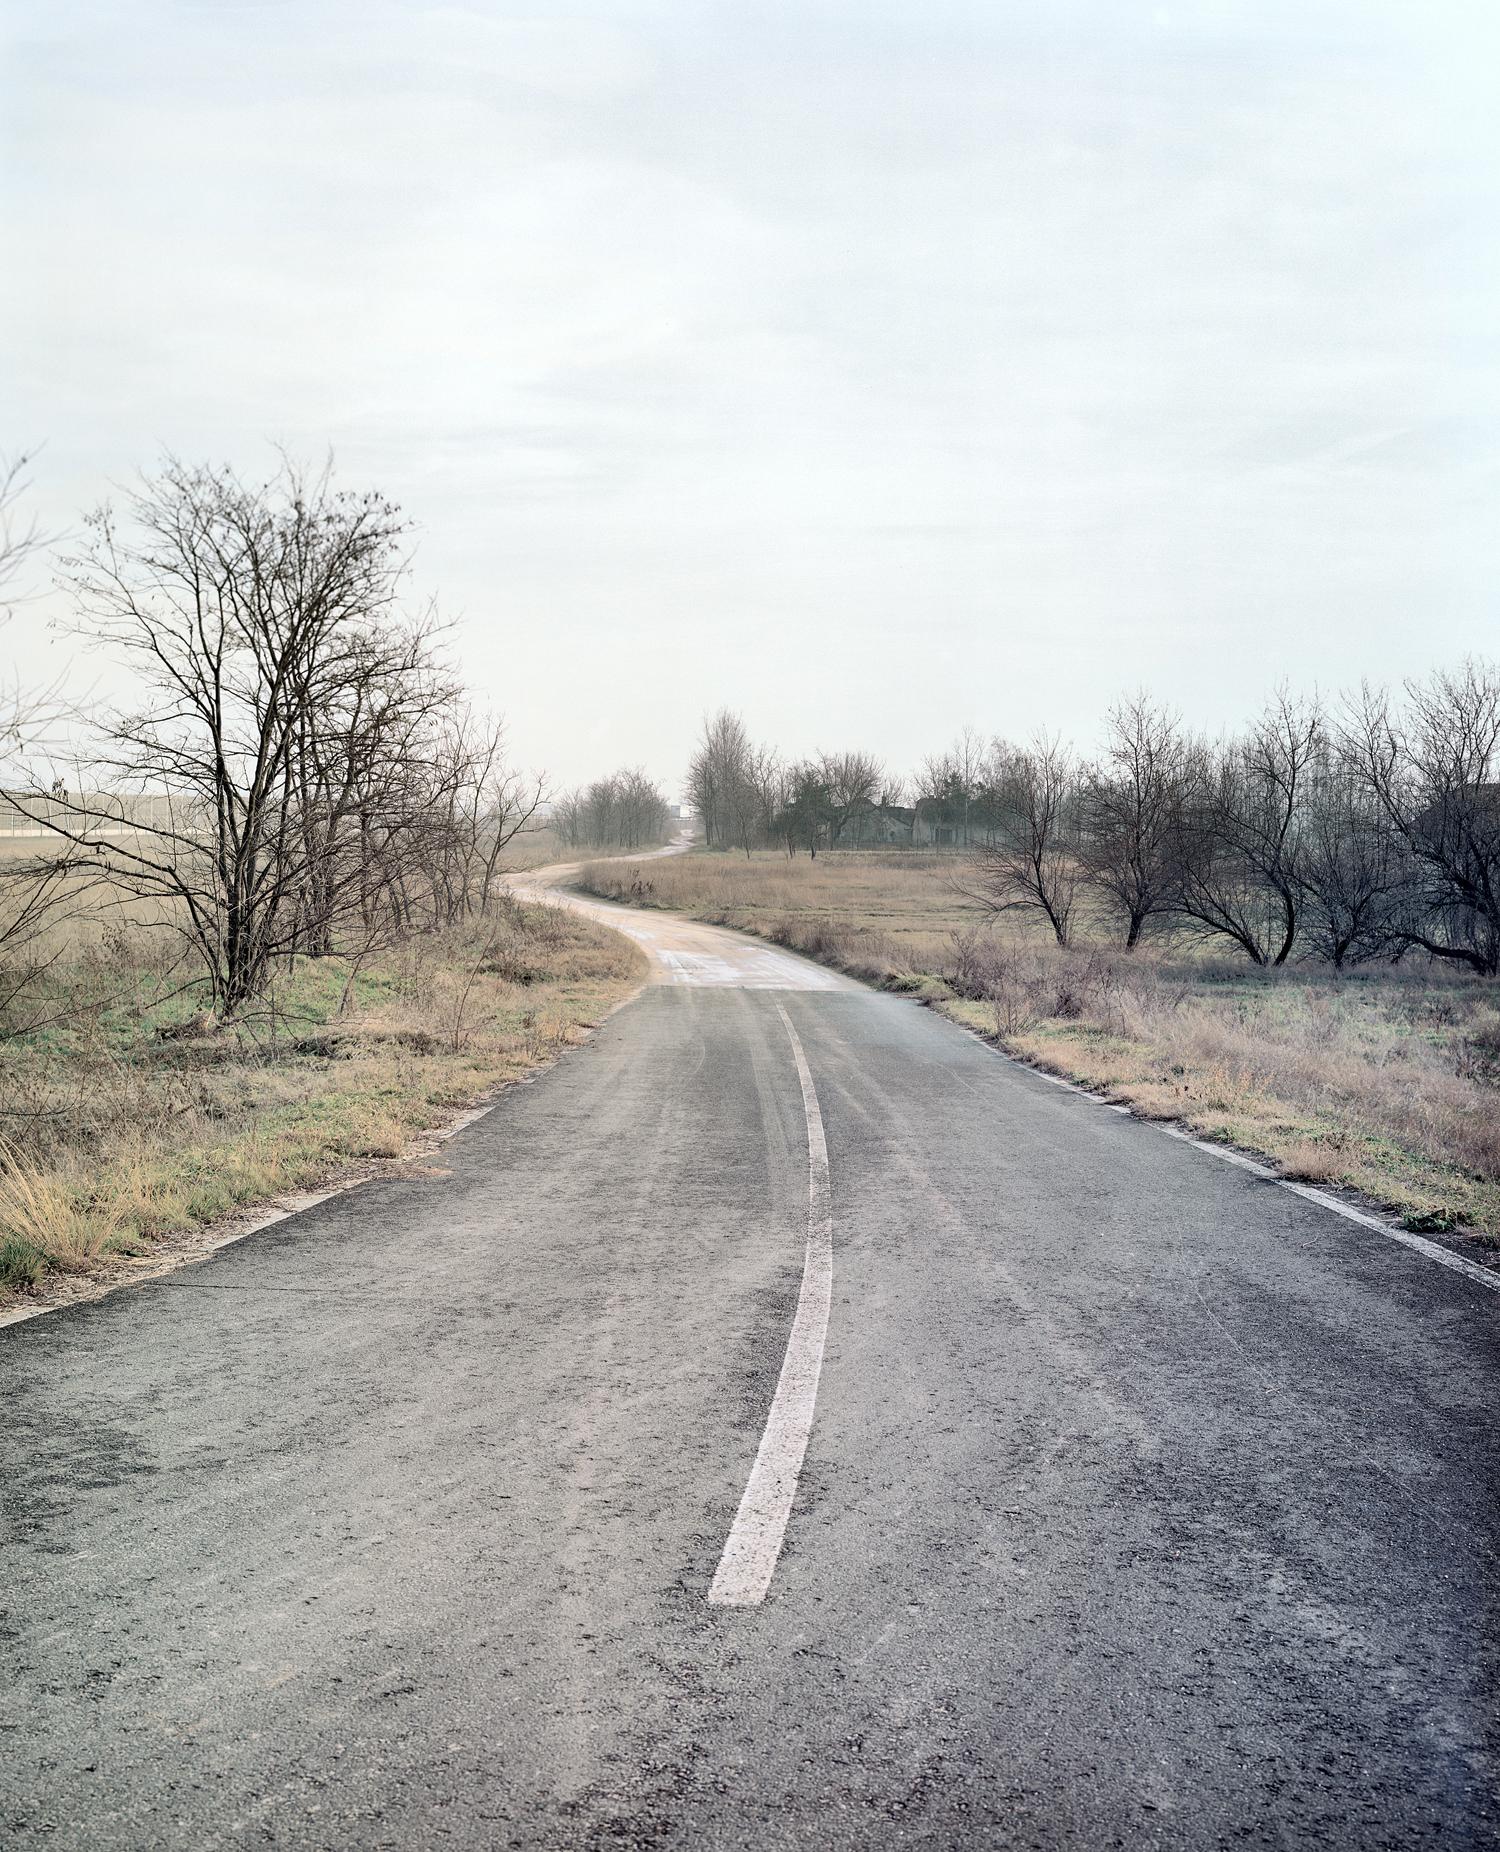 """The End of the Paved Road"" byHernád Géza"